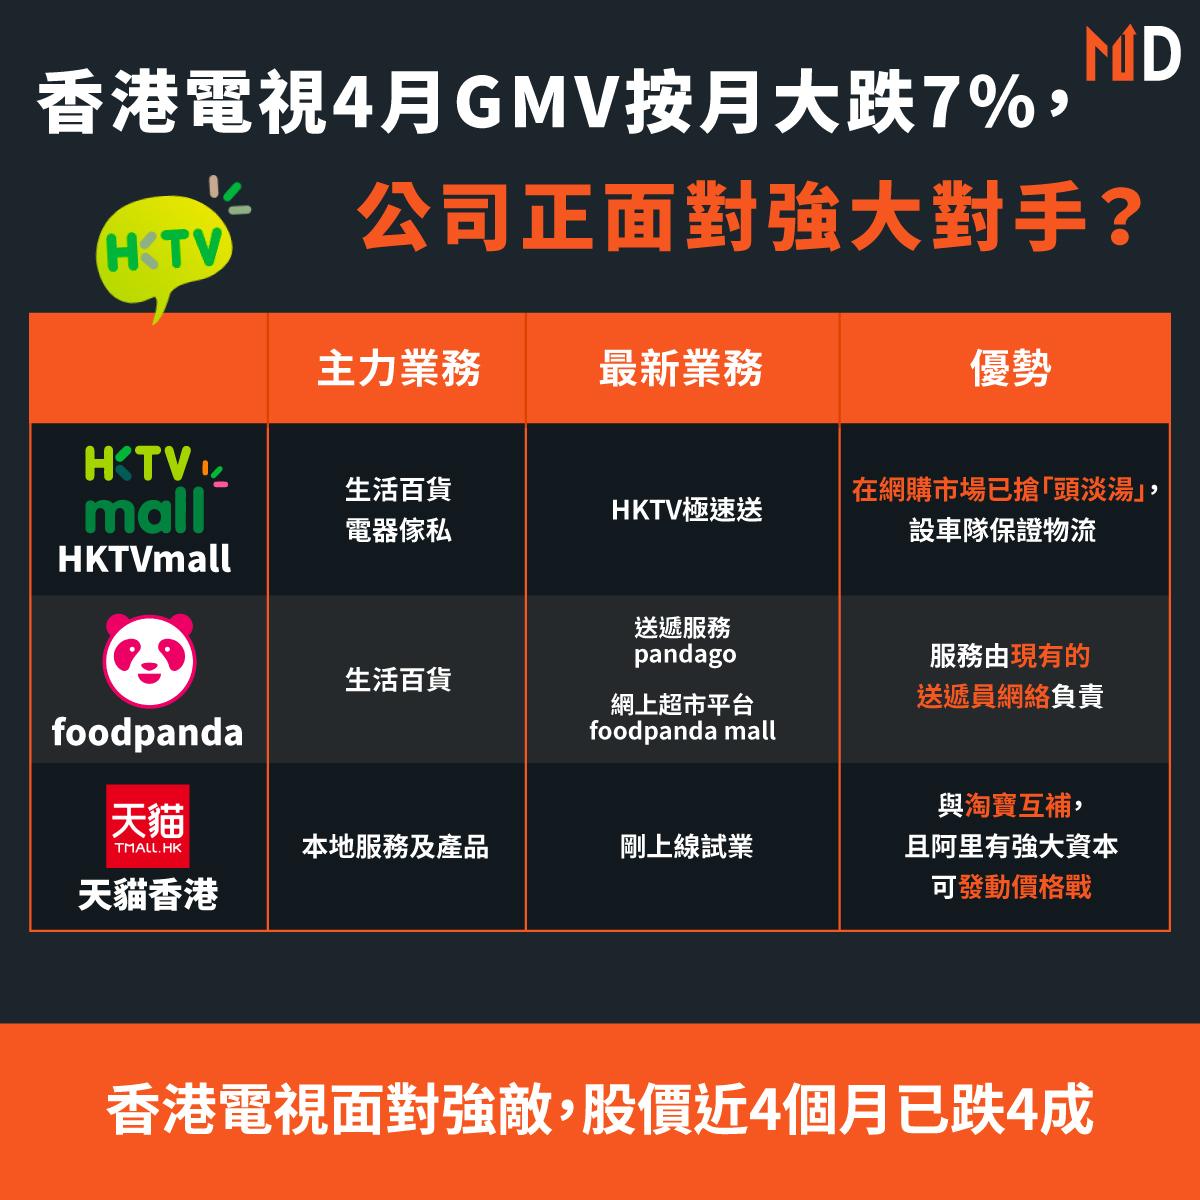 網購平台hktvmall,foodpanda mall,天貓香港